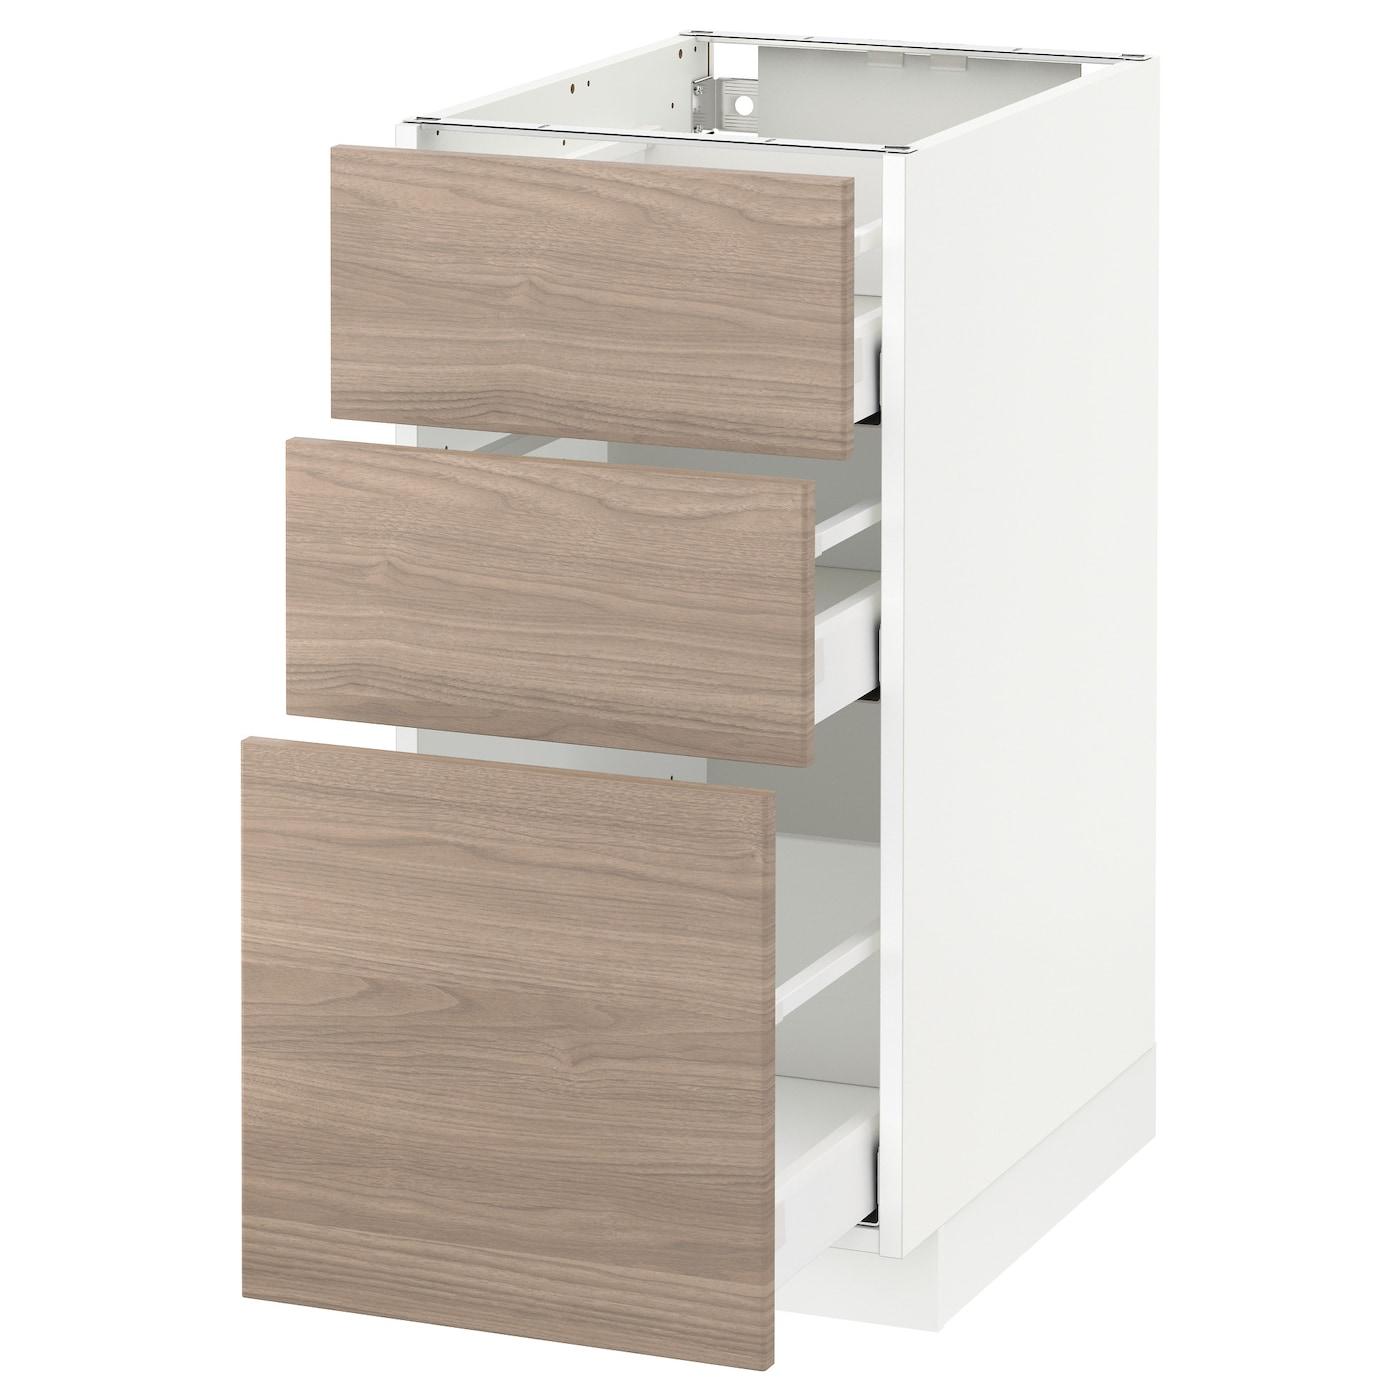 METOD / MAXIMERA Élément bas 11 tiroirs - blanc/Brokhult gris clair 11x11 cm